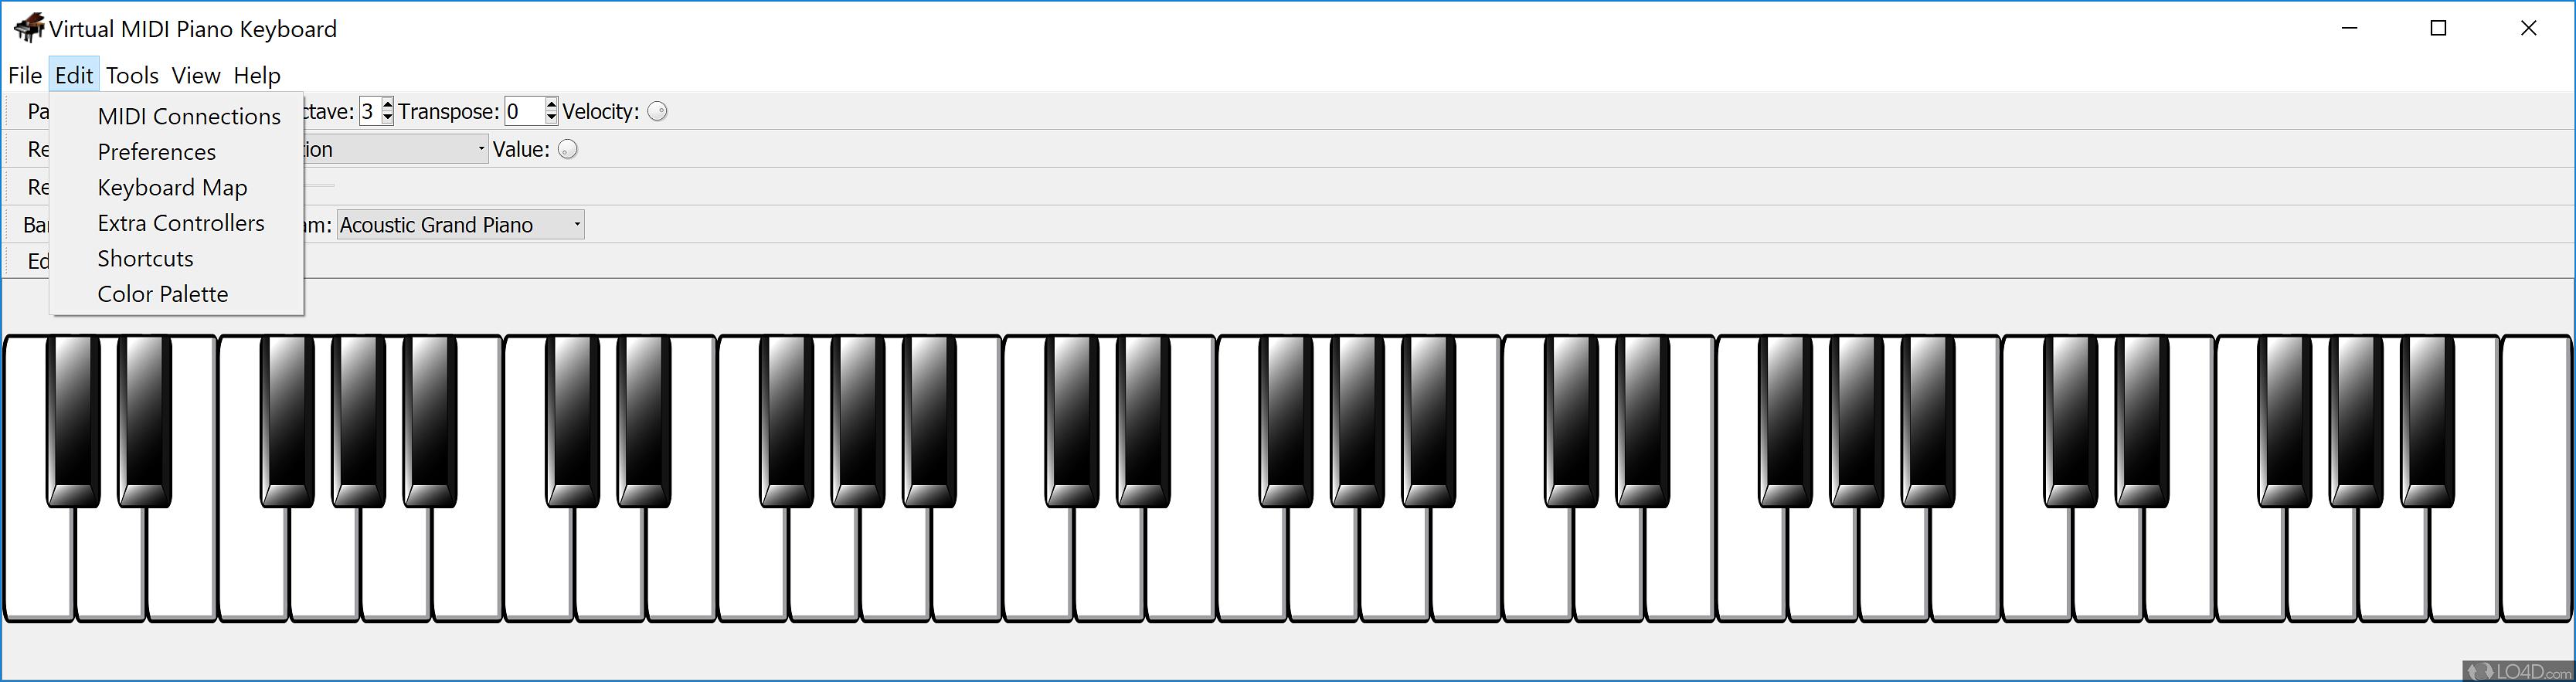 Virtual Midi Piano Keyboard Ableton Lo4d Com